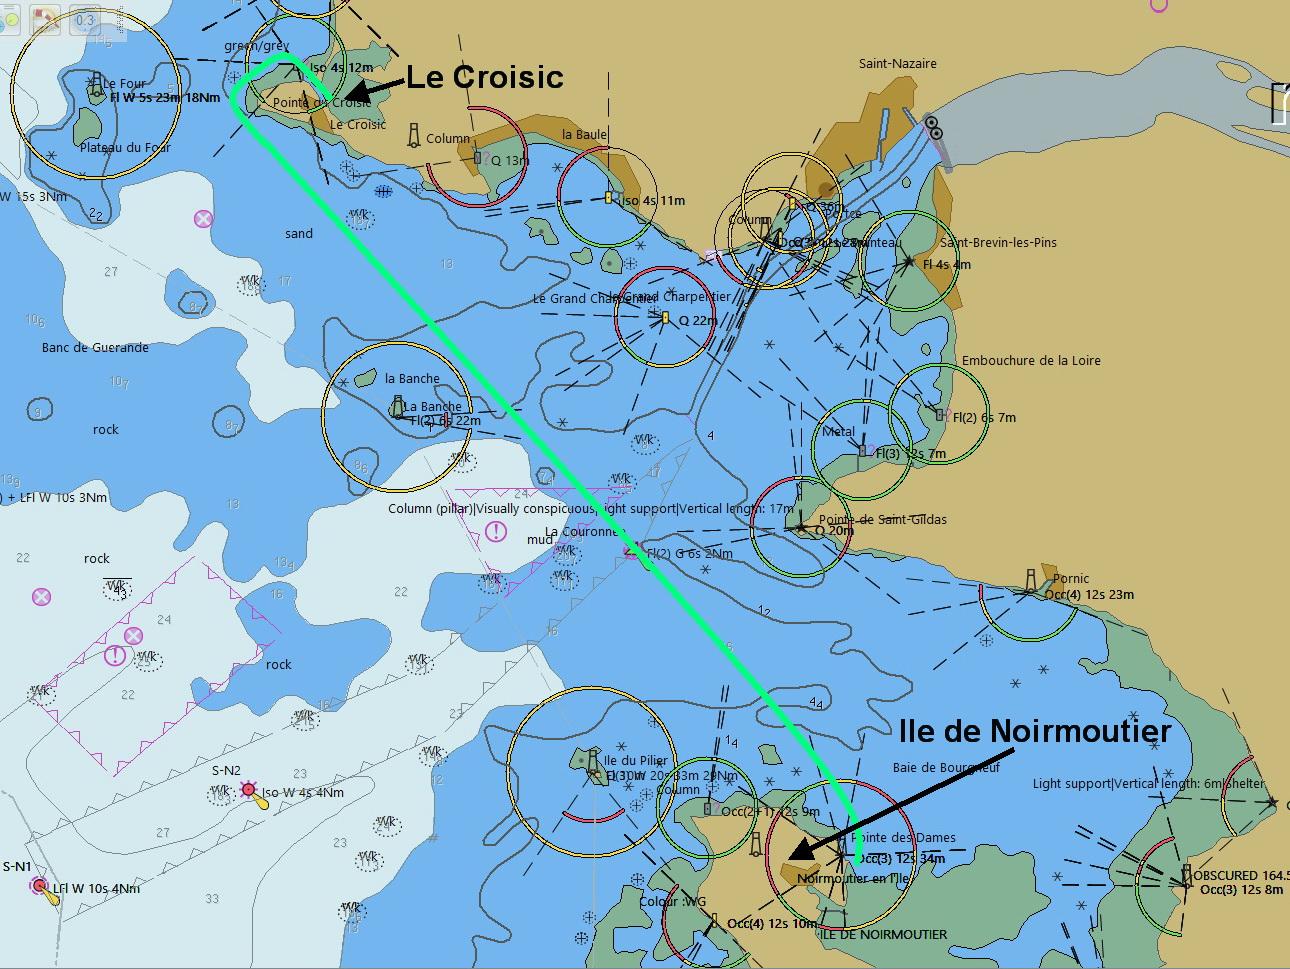 Van Le Croisic naar Ile de Noimoutier